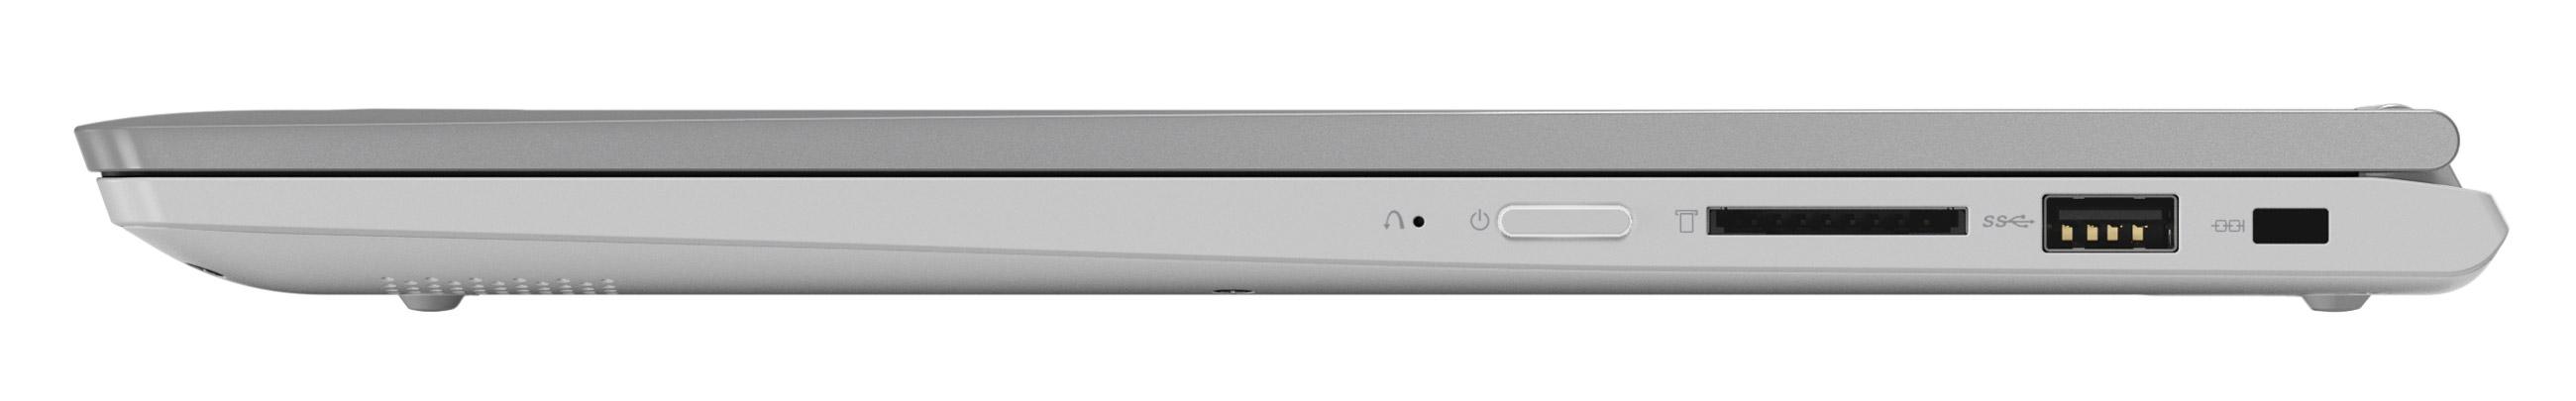 Фото  Ультрабук Lenovo Yoga 530 Mineral Grey (81EK00KJRA)